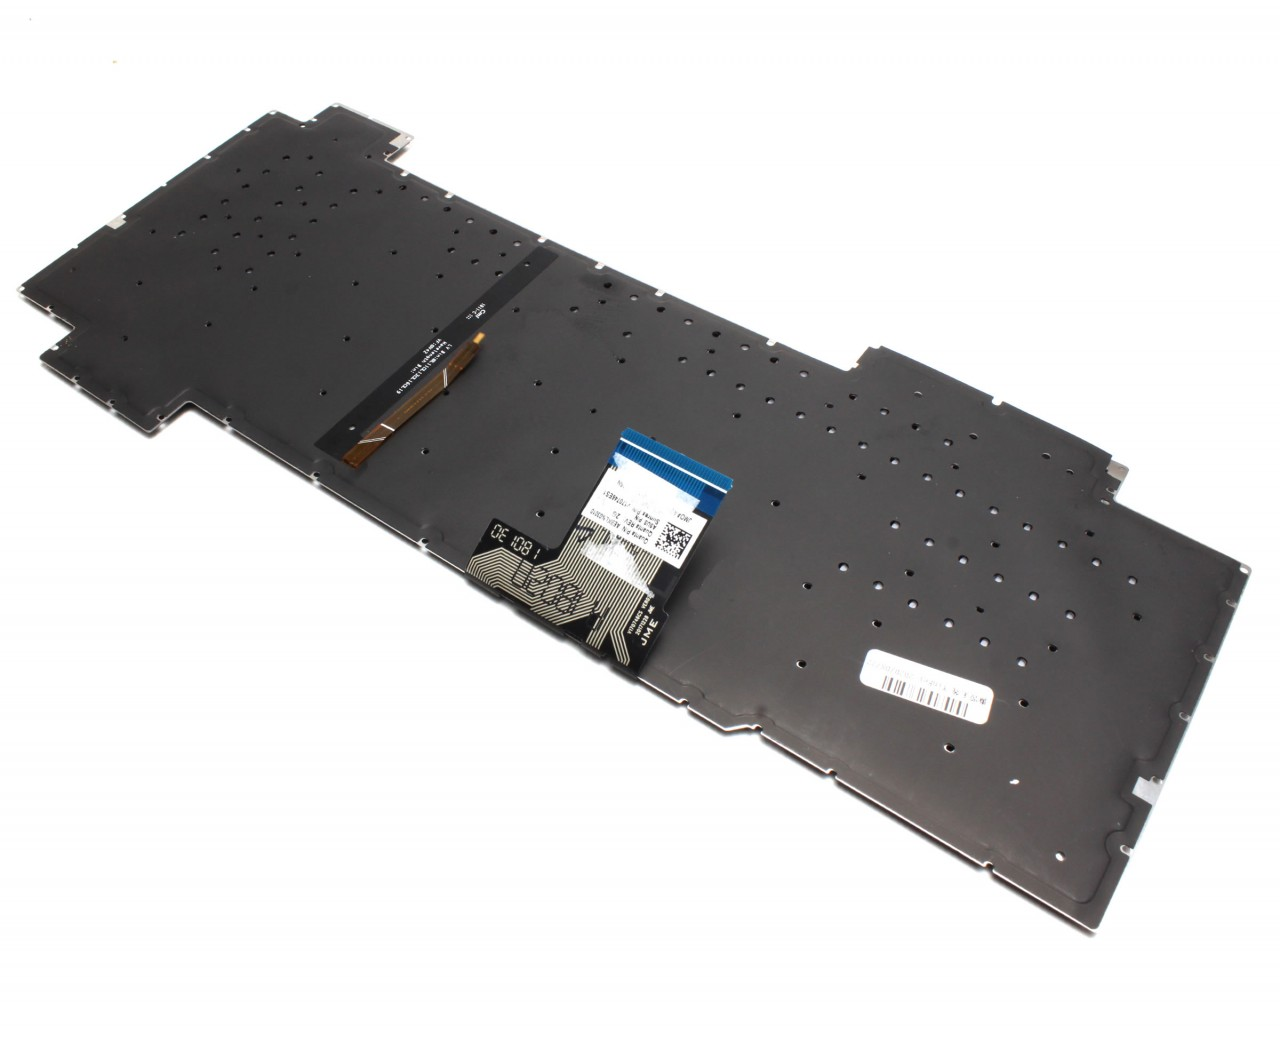 Tastatura neagra cu iluminare rosie pe marginea tastelor Asus TUF Gaming FX504GD-RS51 iluminata layout US fara rama enter mic imagine powerlaptop.ro 2021